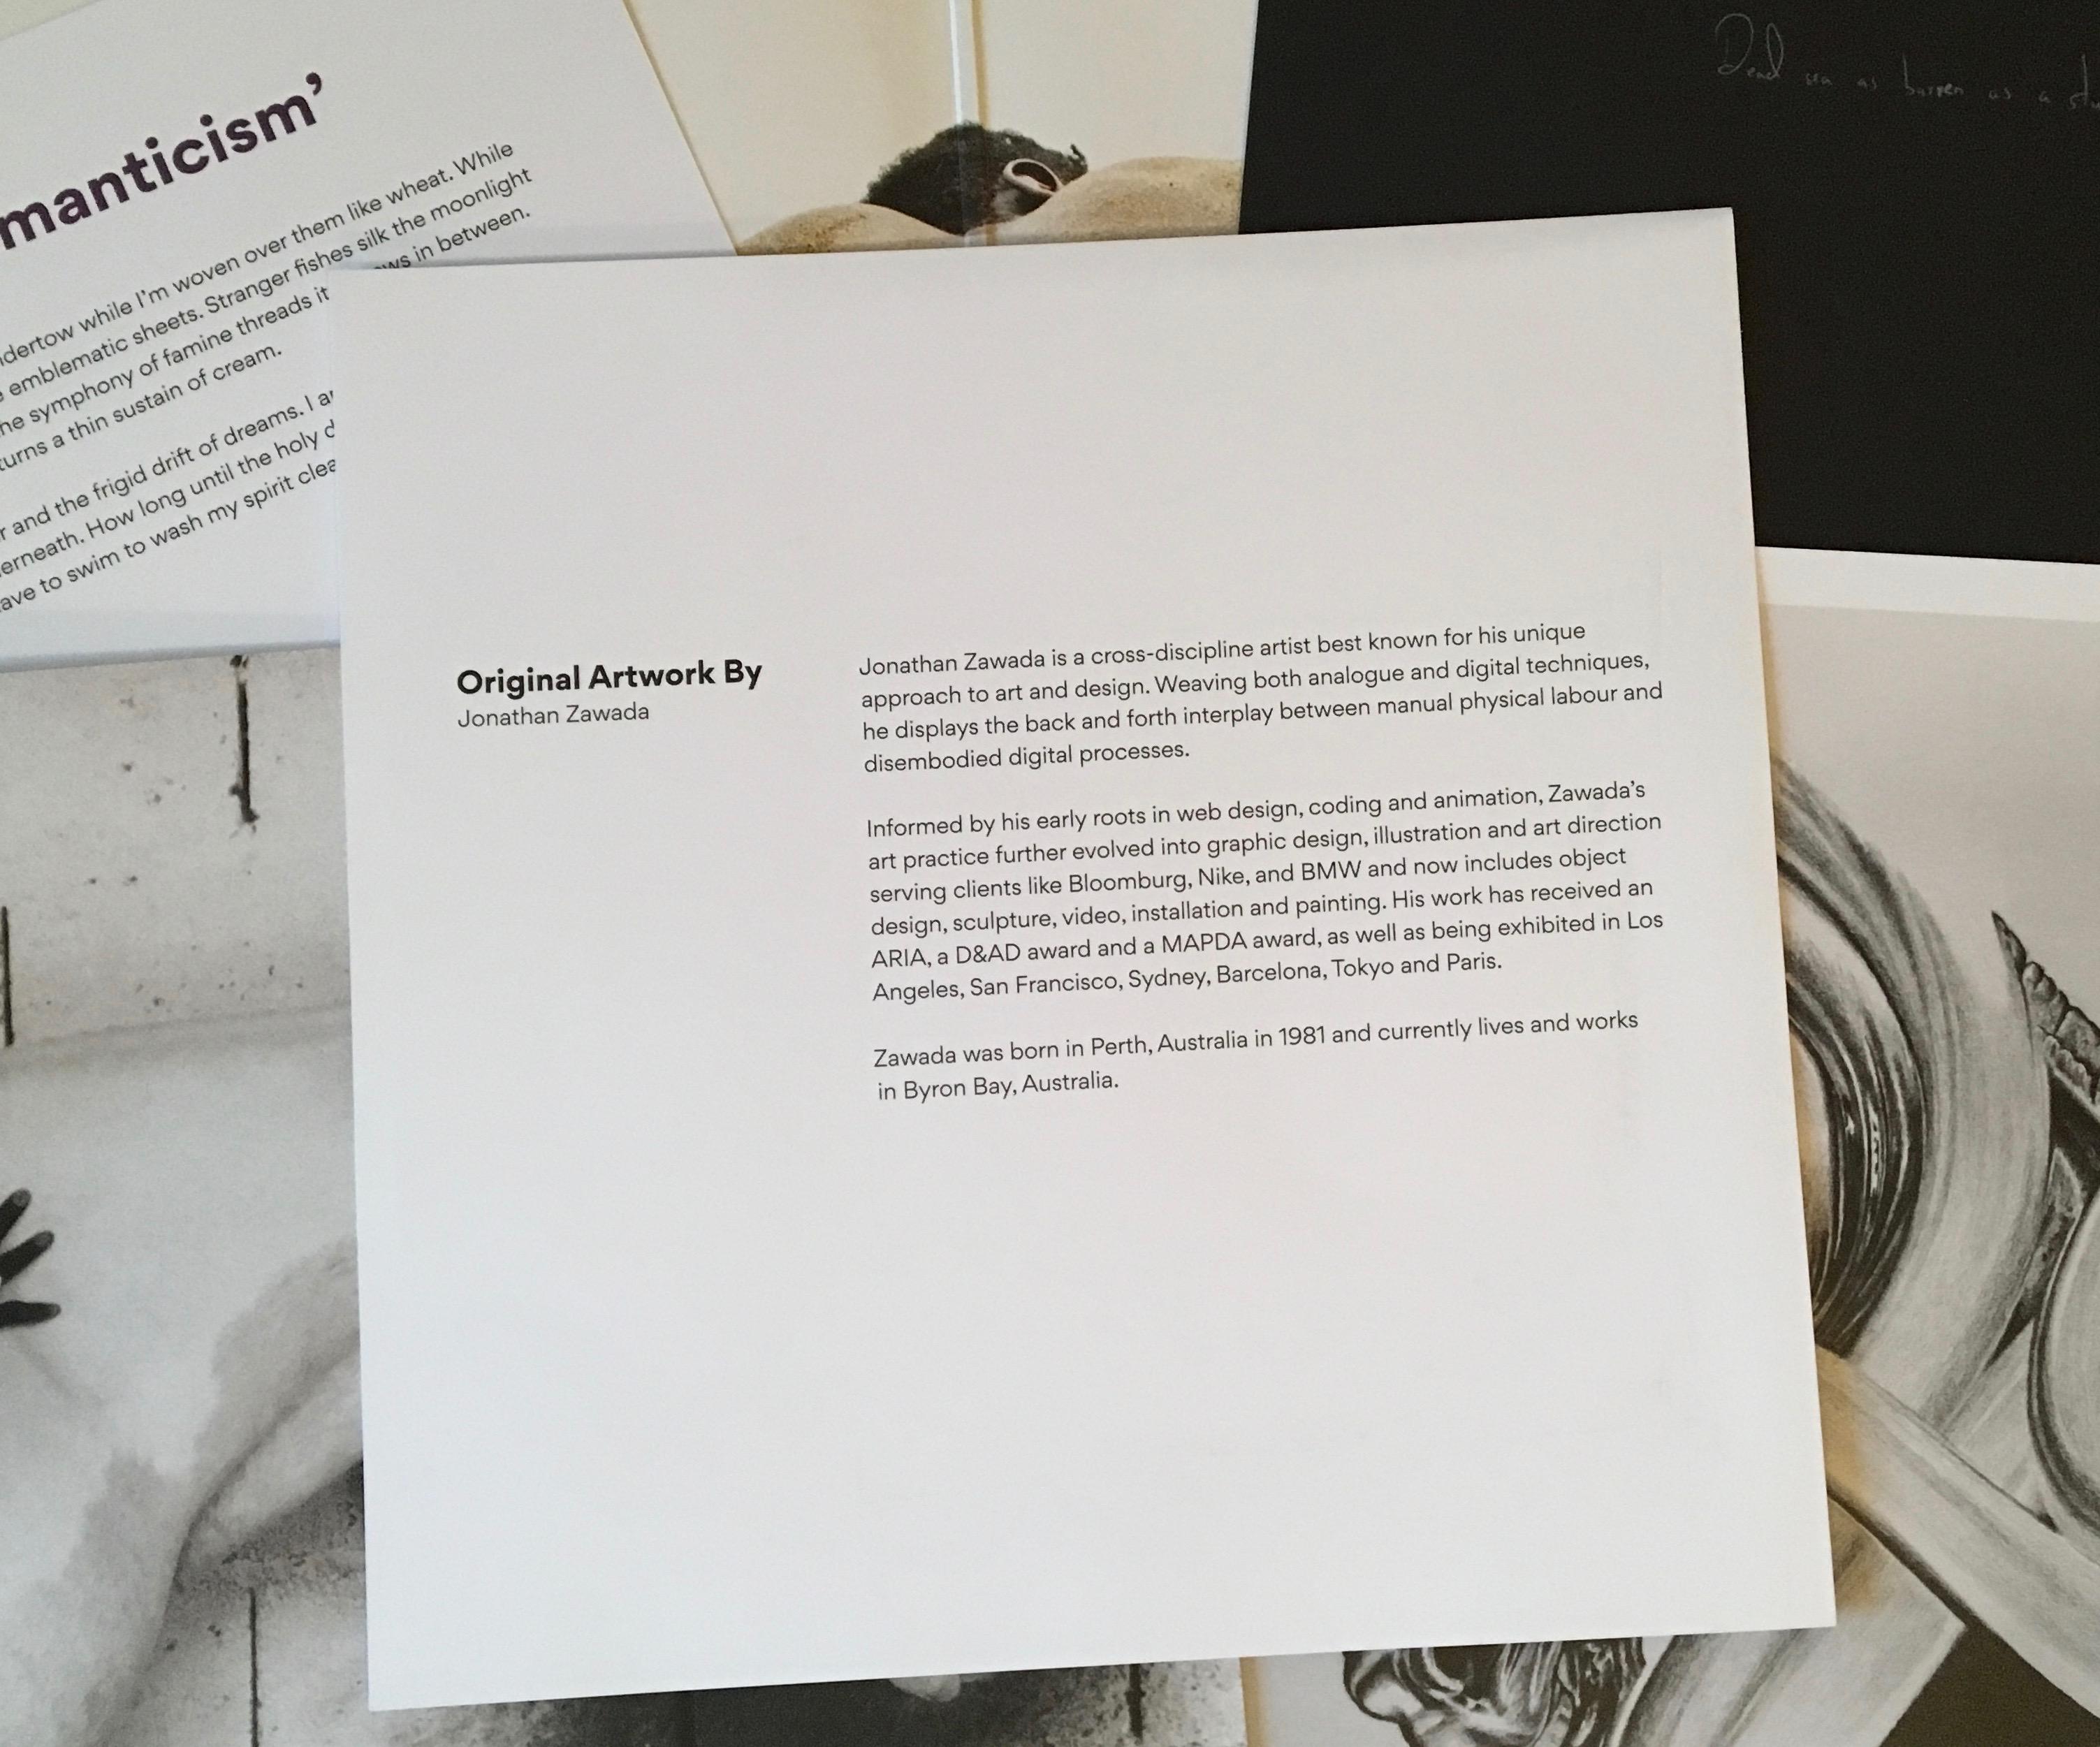 Geek insider, geekinsider, geekinsider. Com,, vinyl me, please october edition: moses sumney 'aromanticism', culture, events